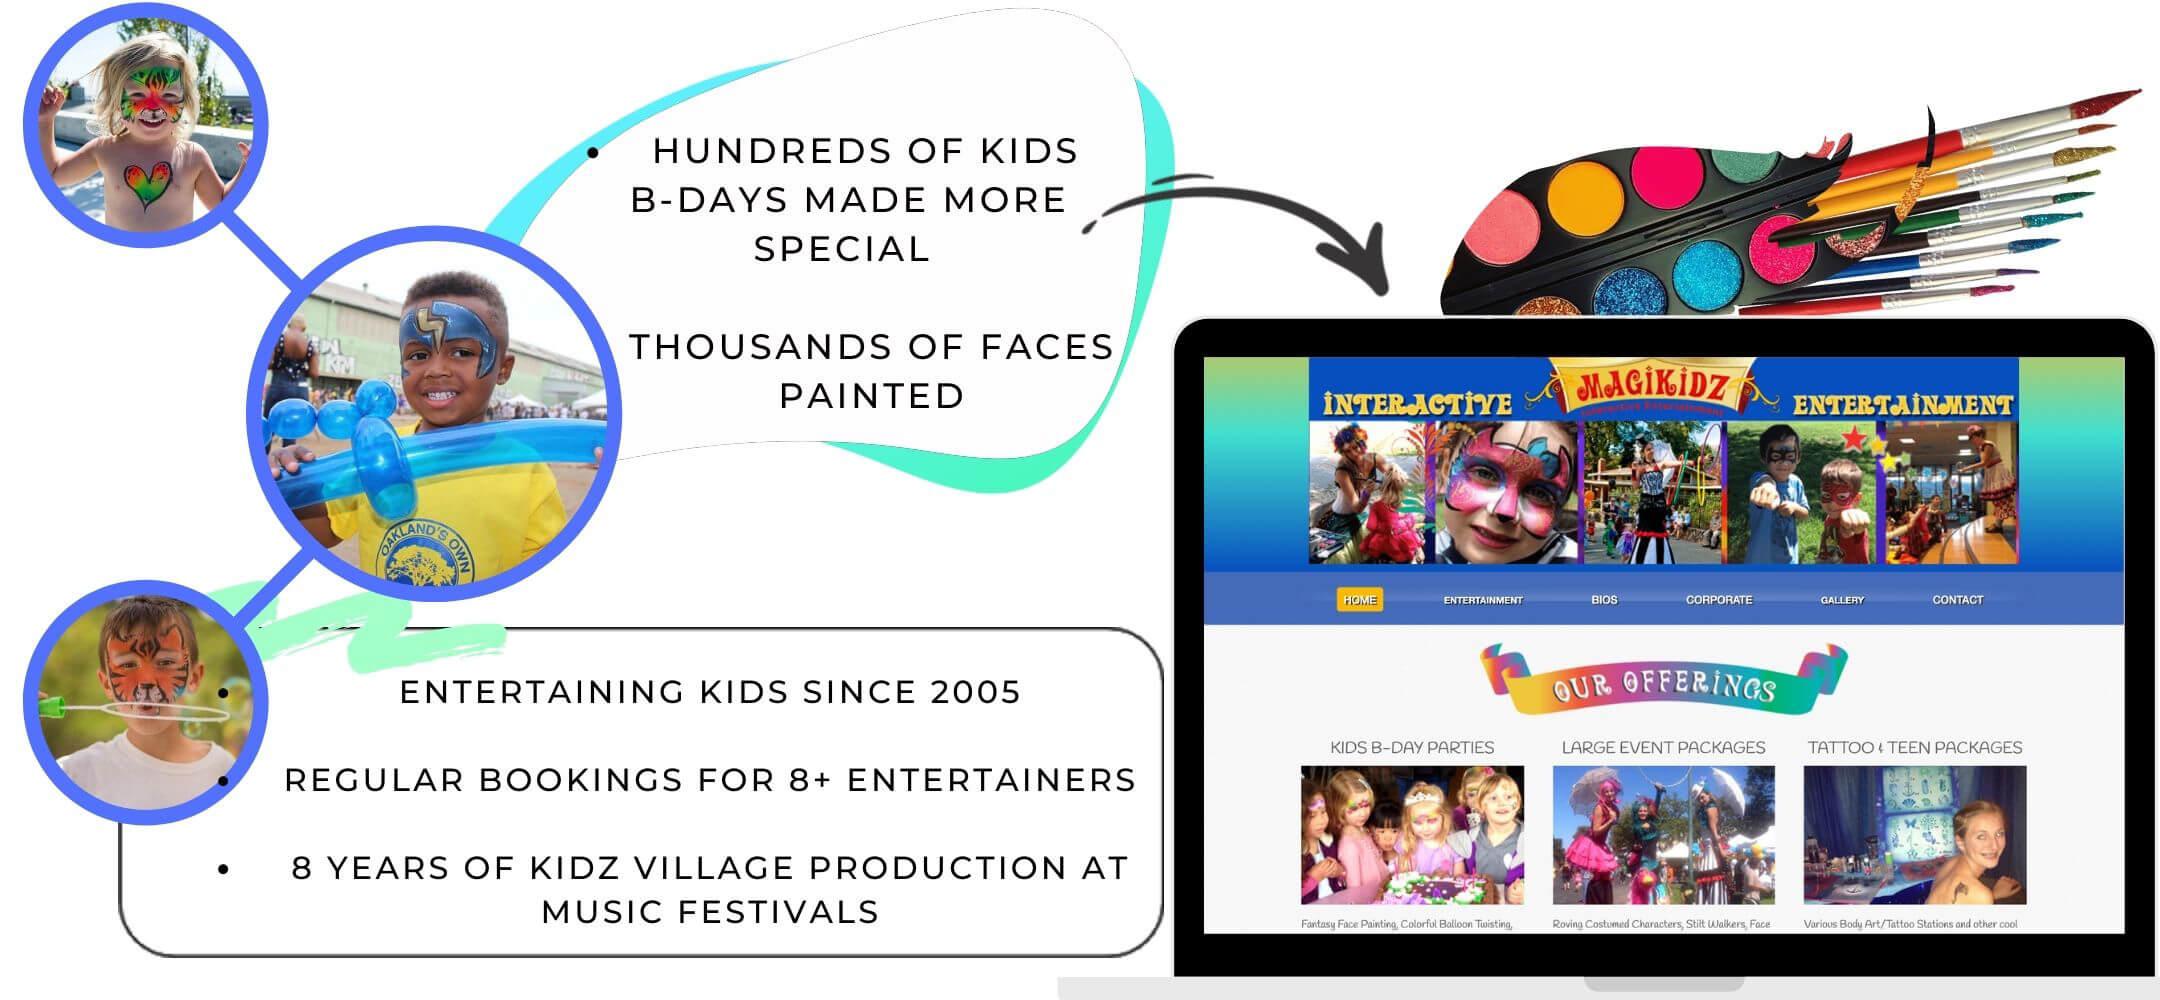 MagiKidz - kids entertainment company